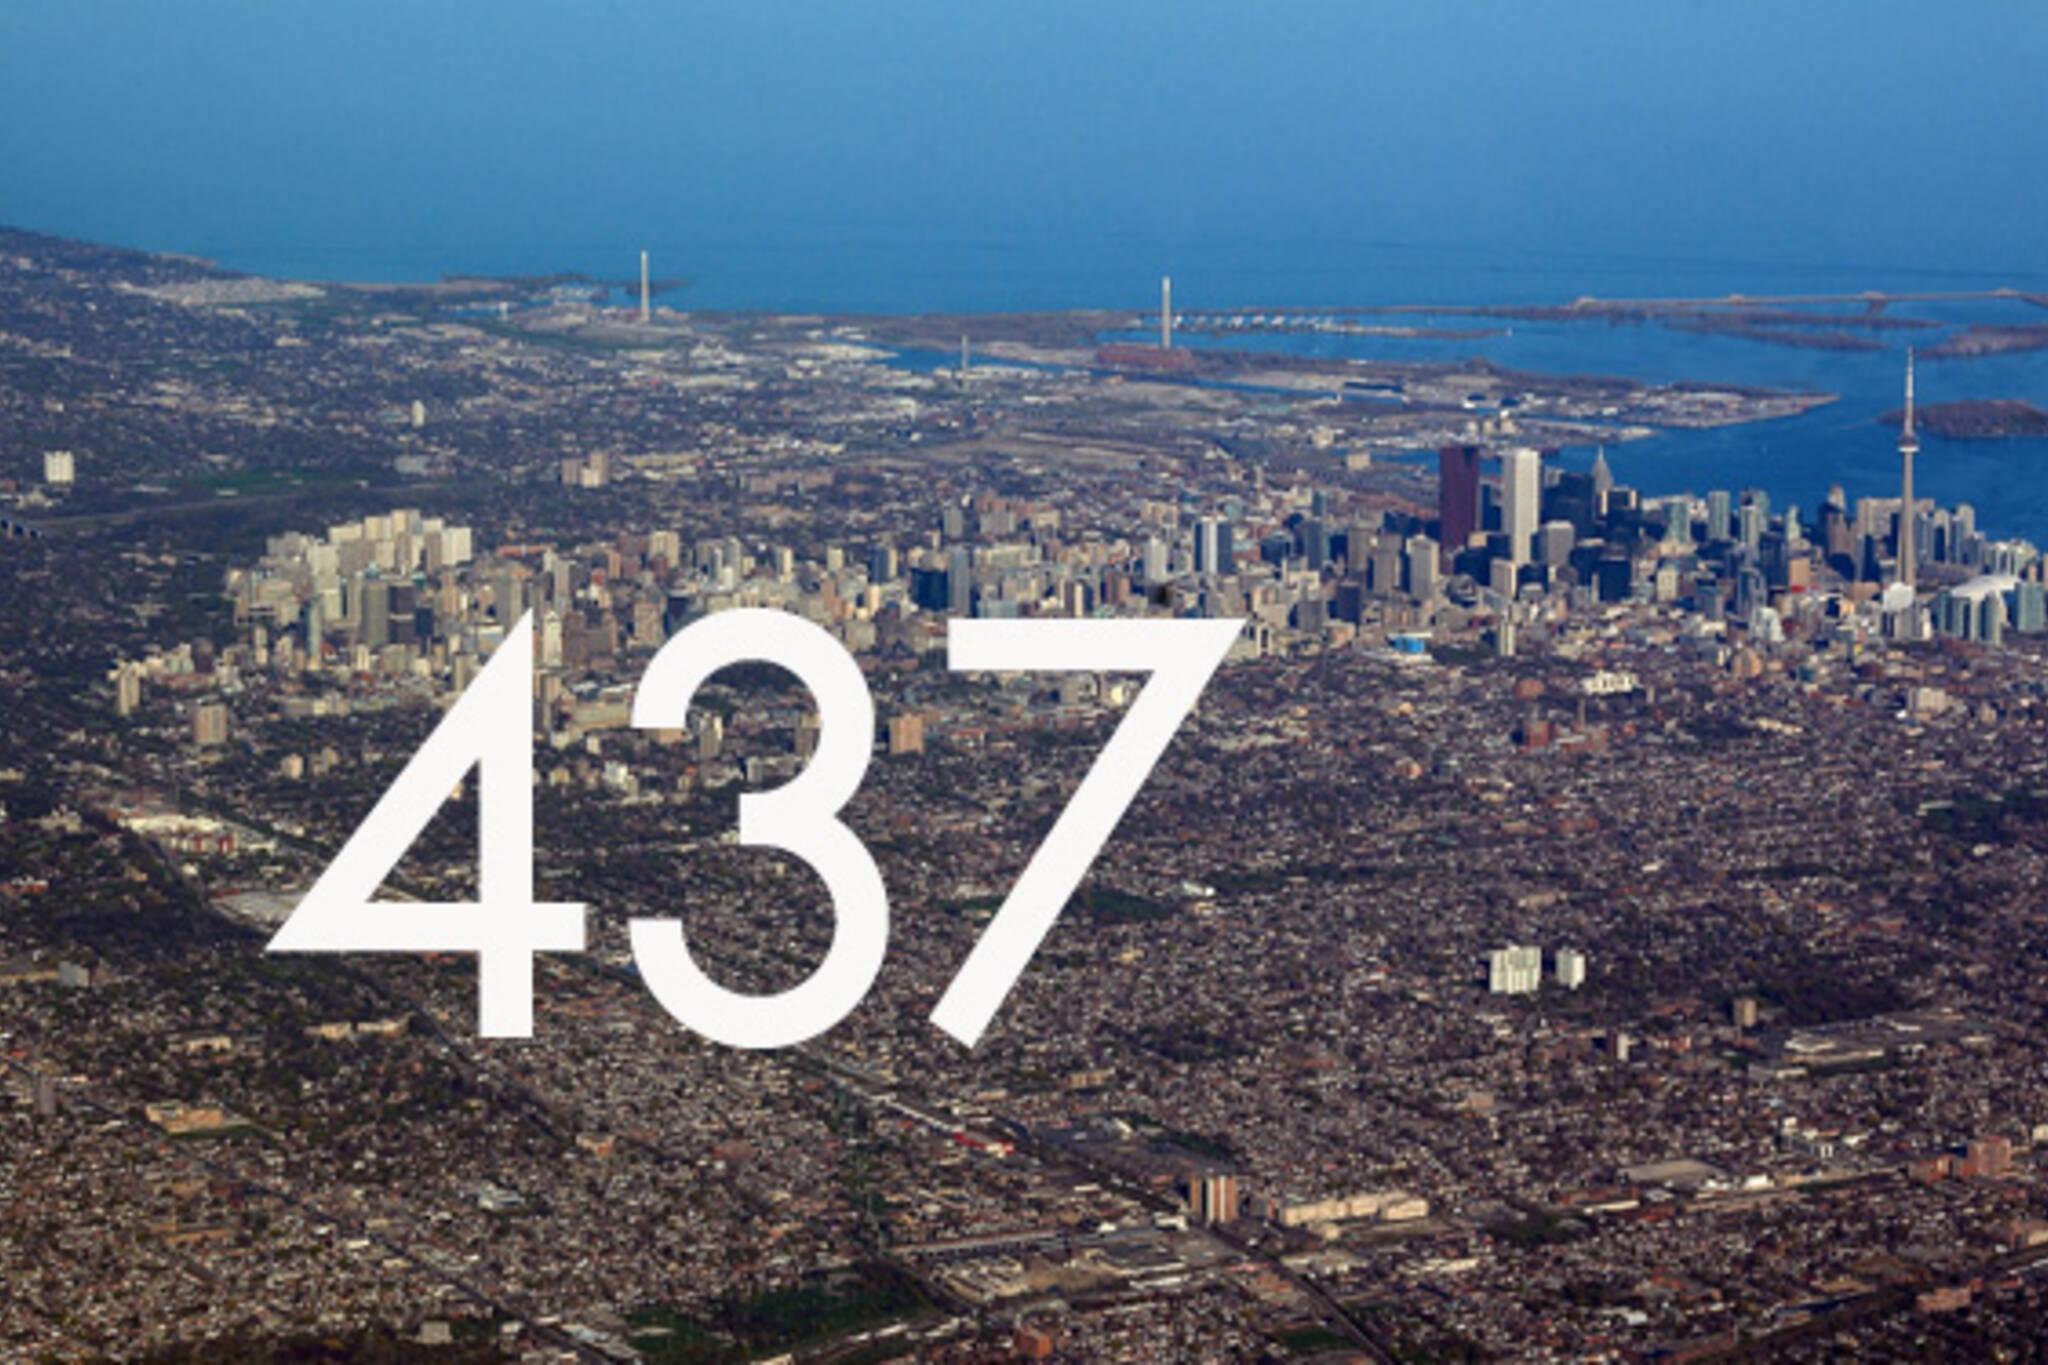 Toronto area code 437